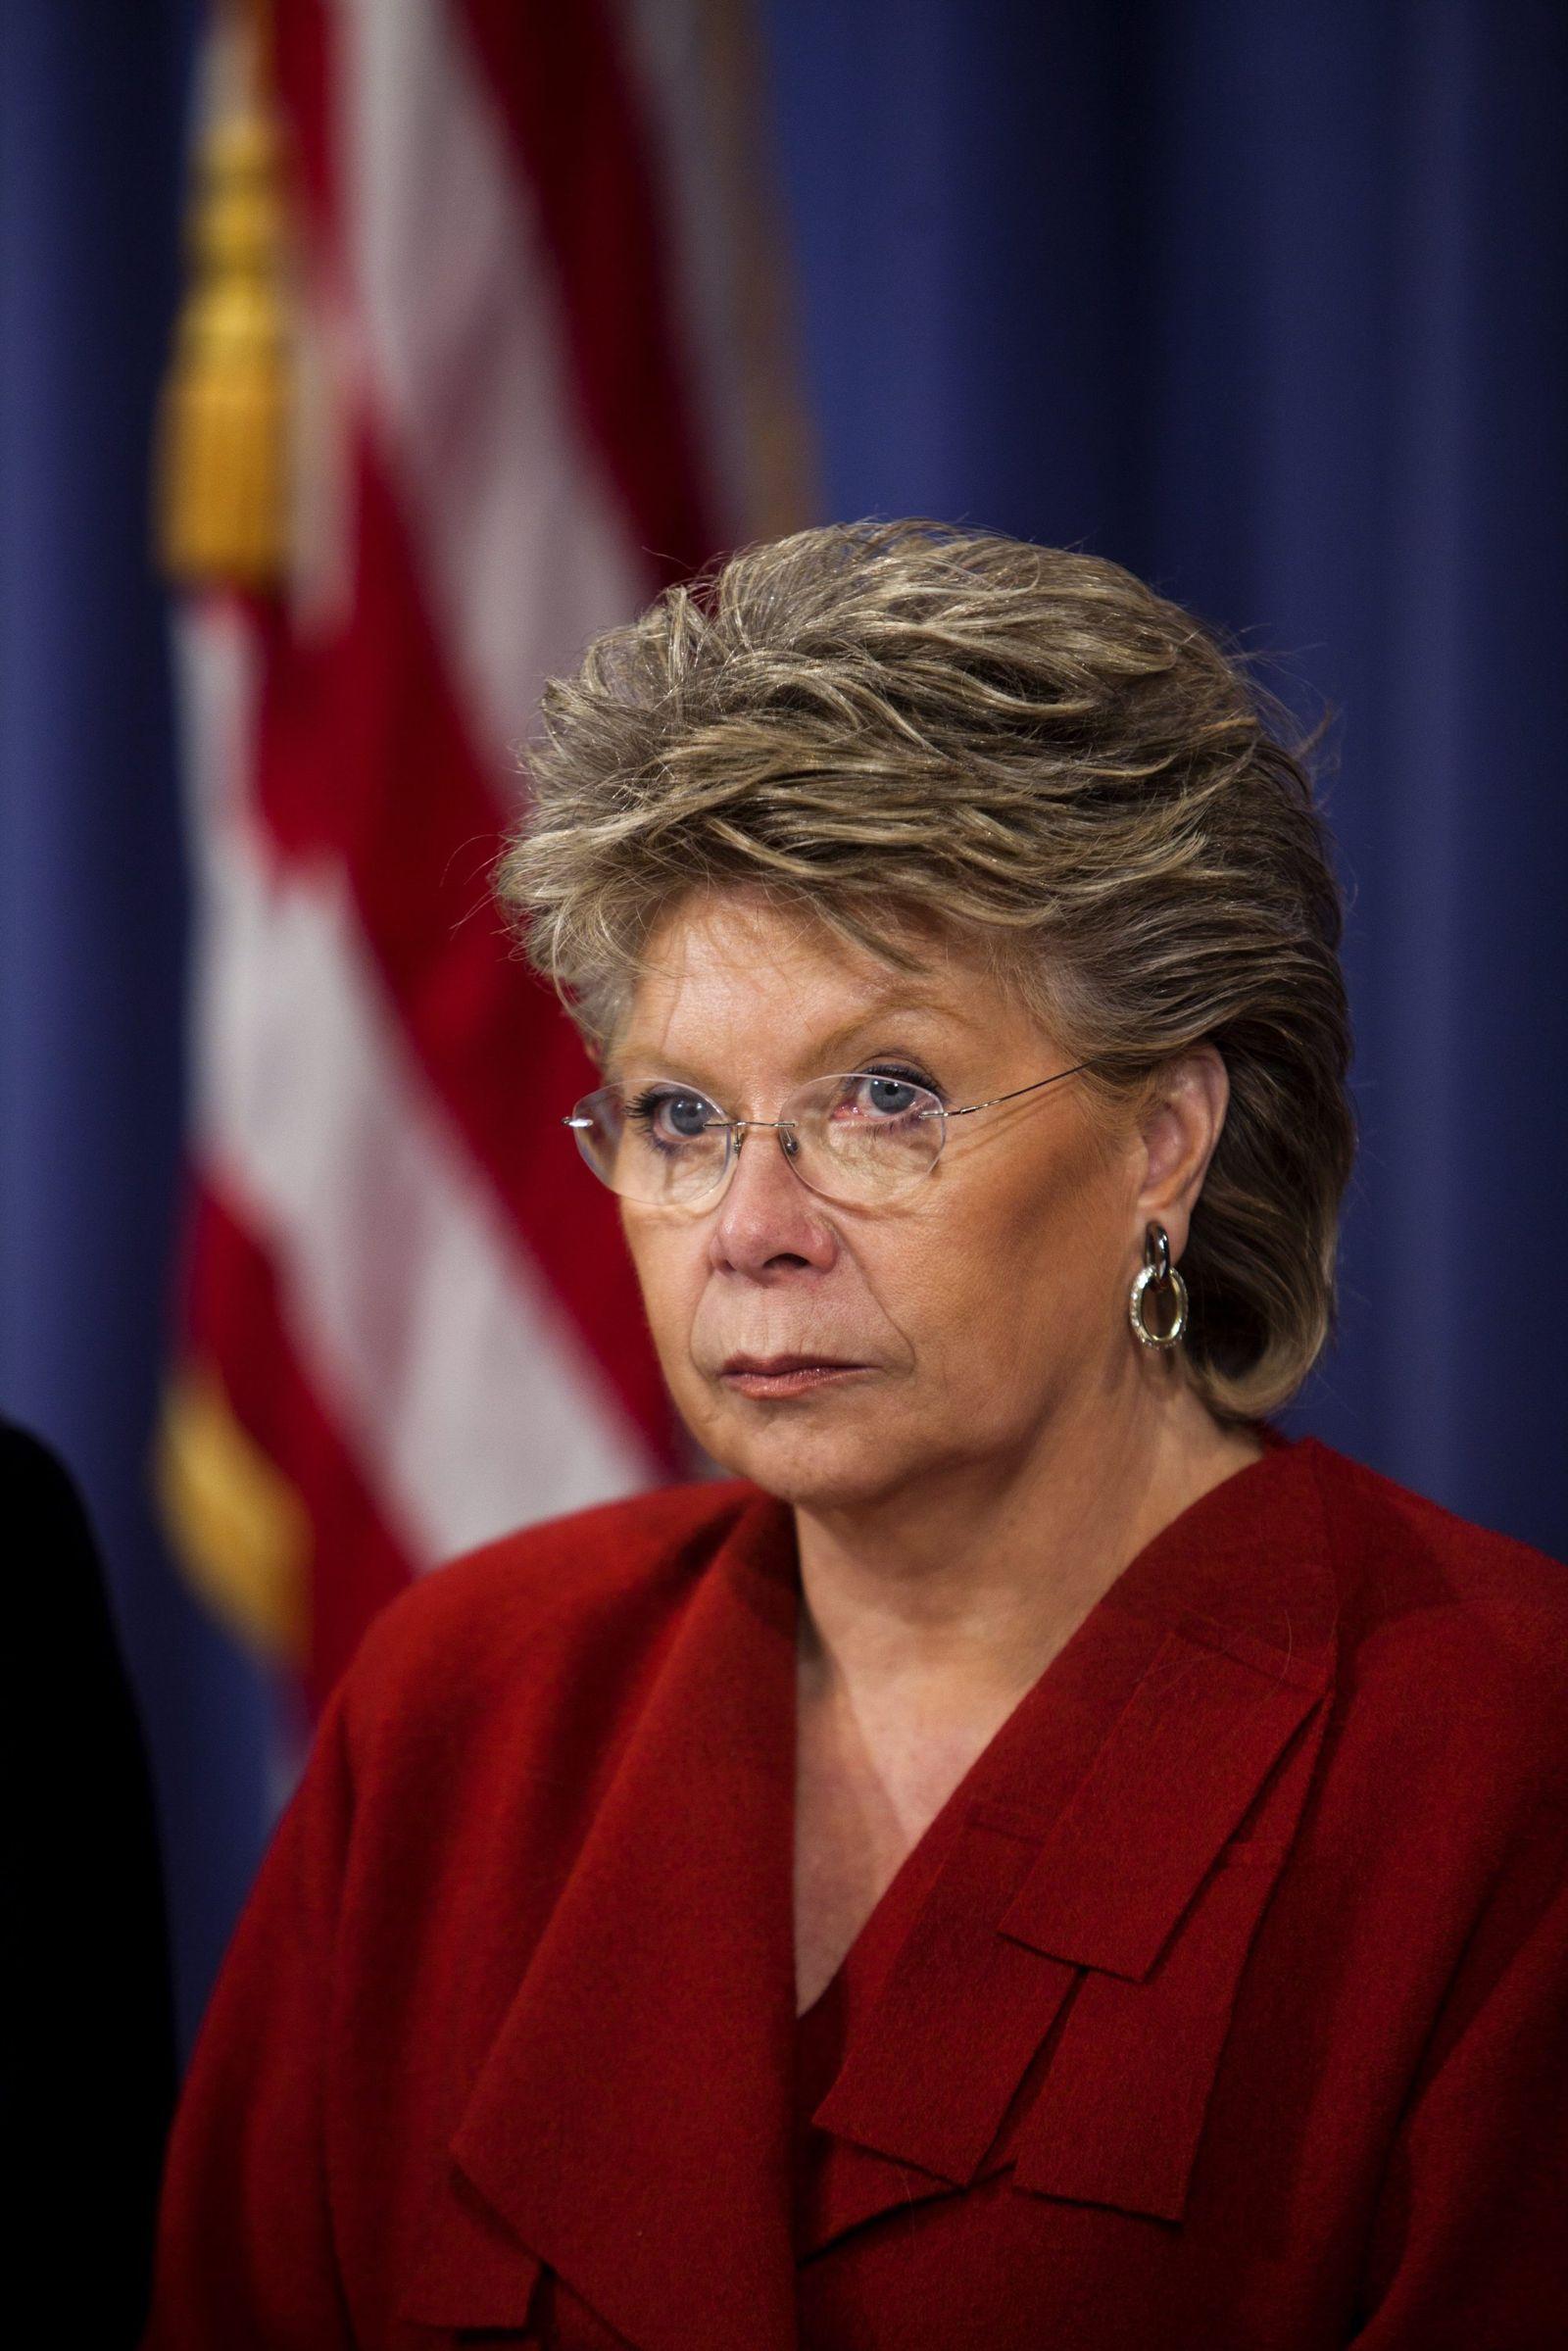 Napolitano and Holder Speak to Meida After U.S.-E.U. Justice Mini